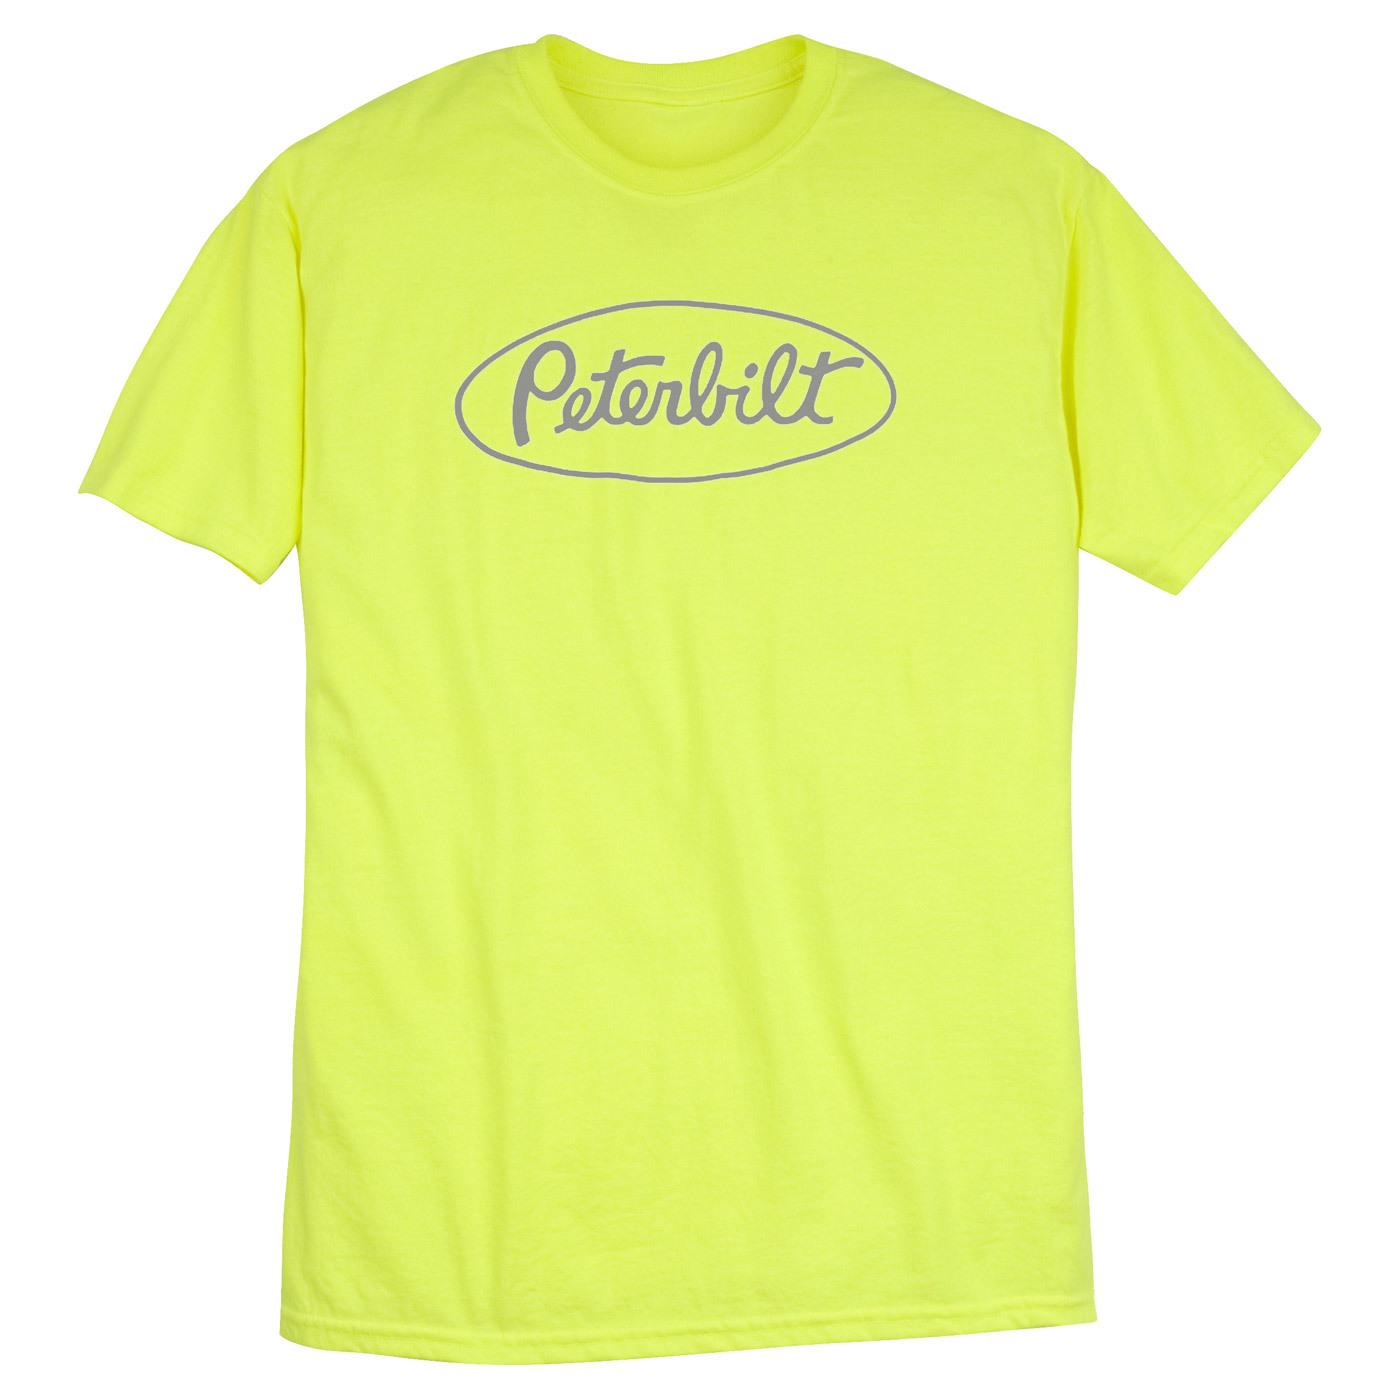 Peterbilt safety green logo t shirt t shirts parts for Safety logo t shirts